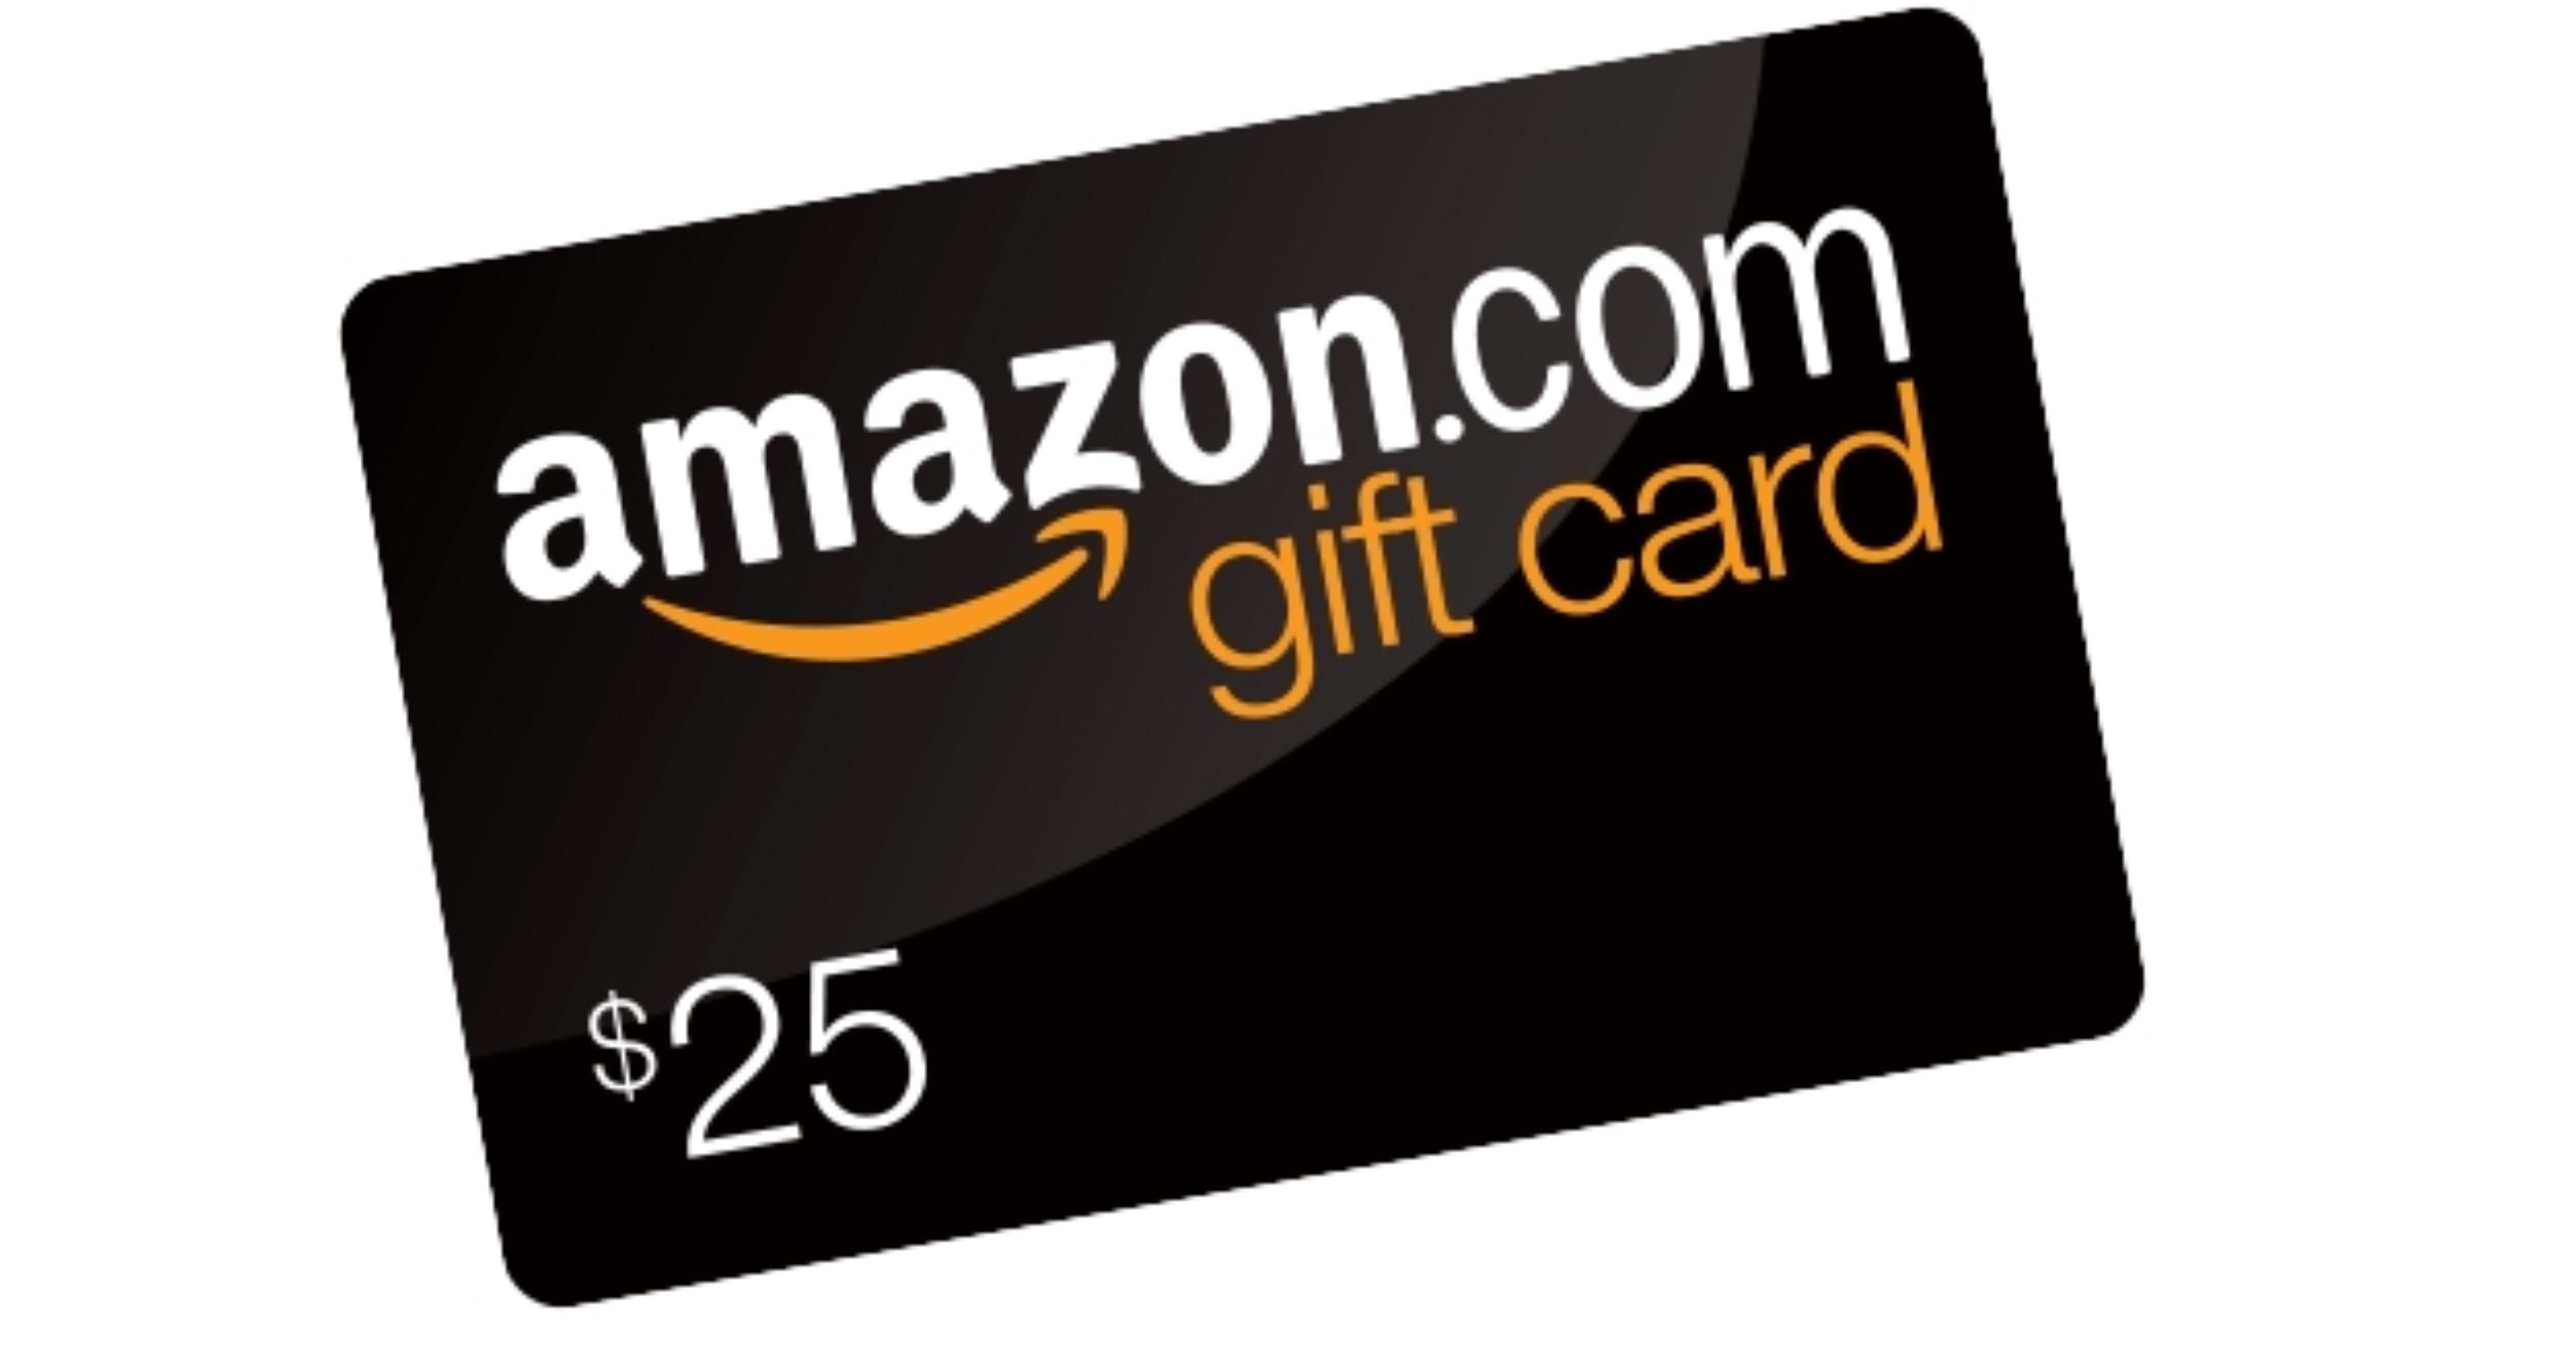 Amazon Gift Card Winners Focus On Christian Education